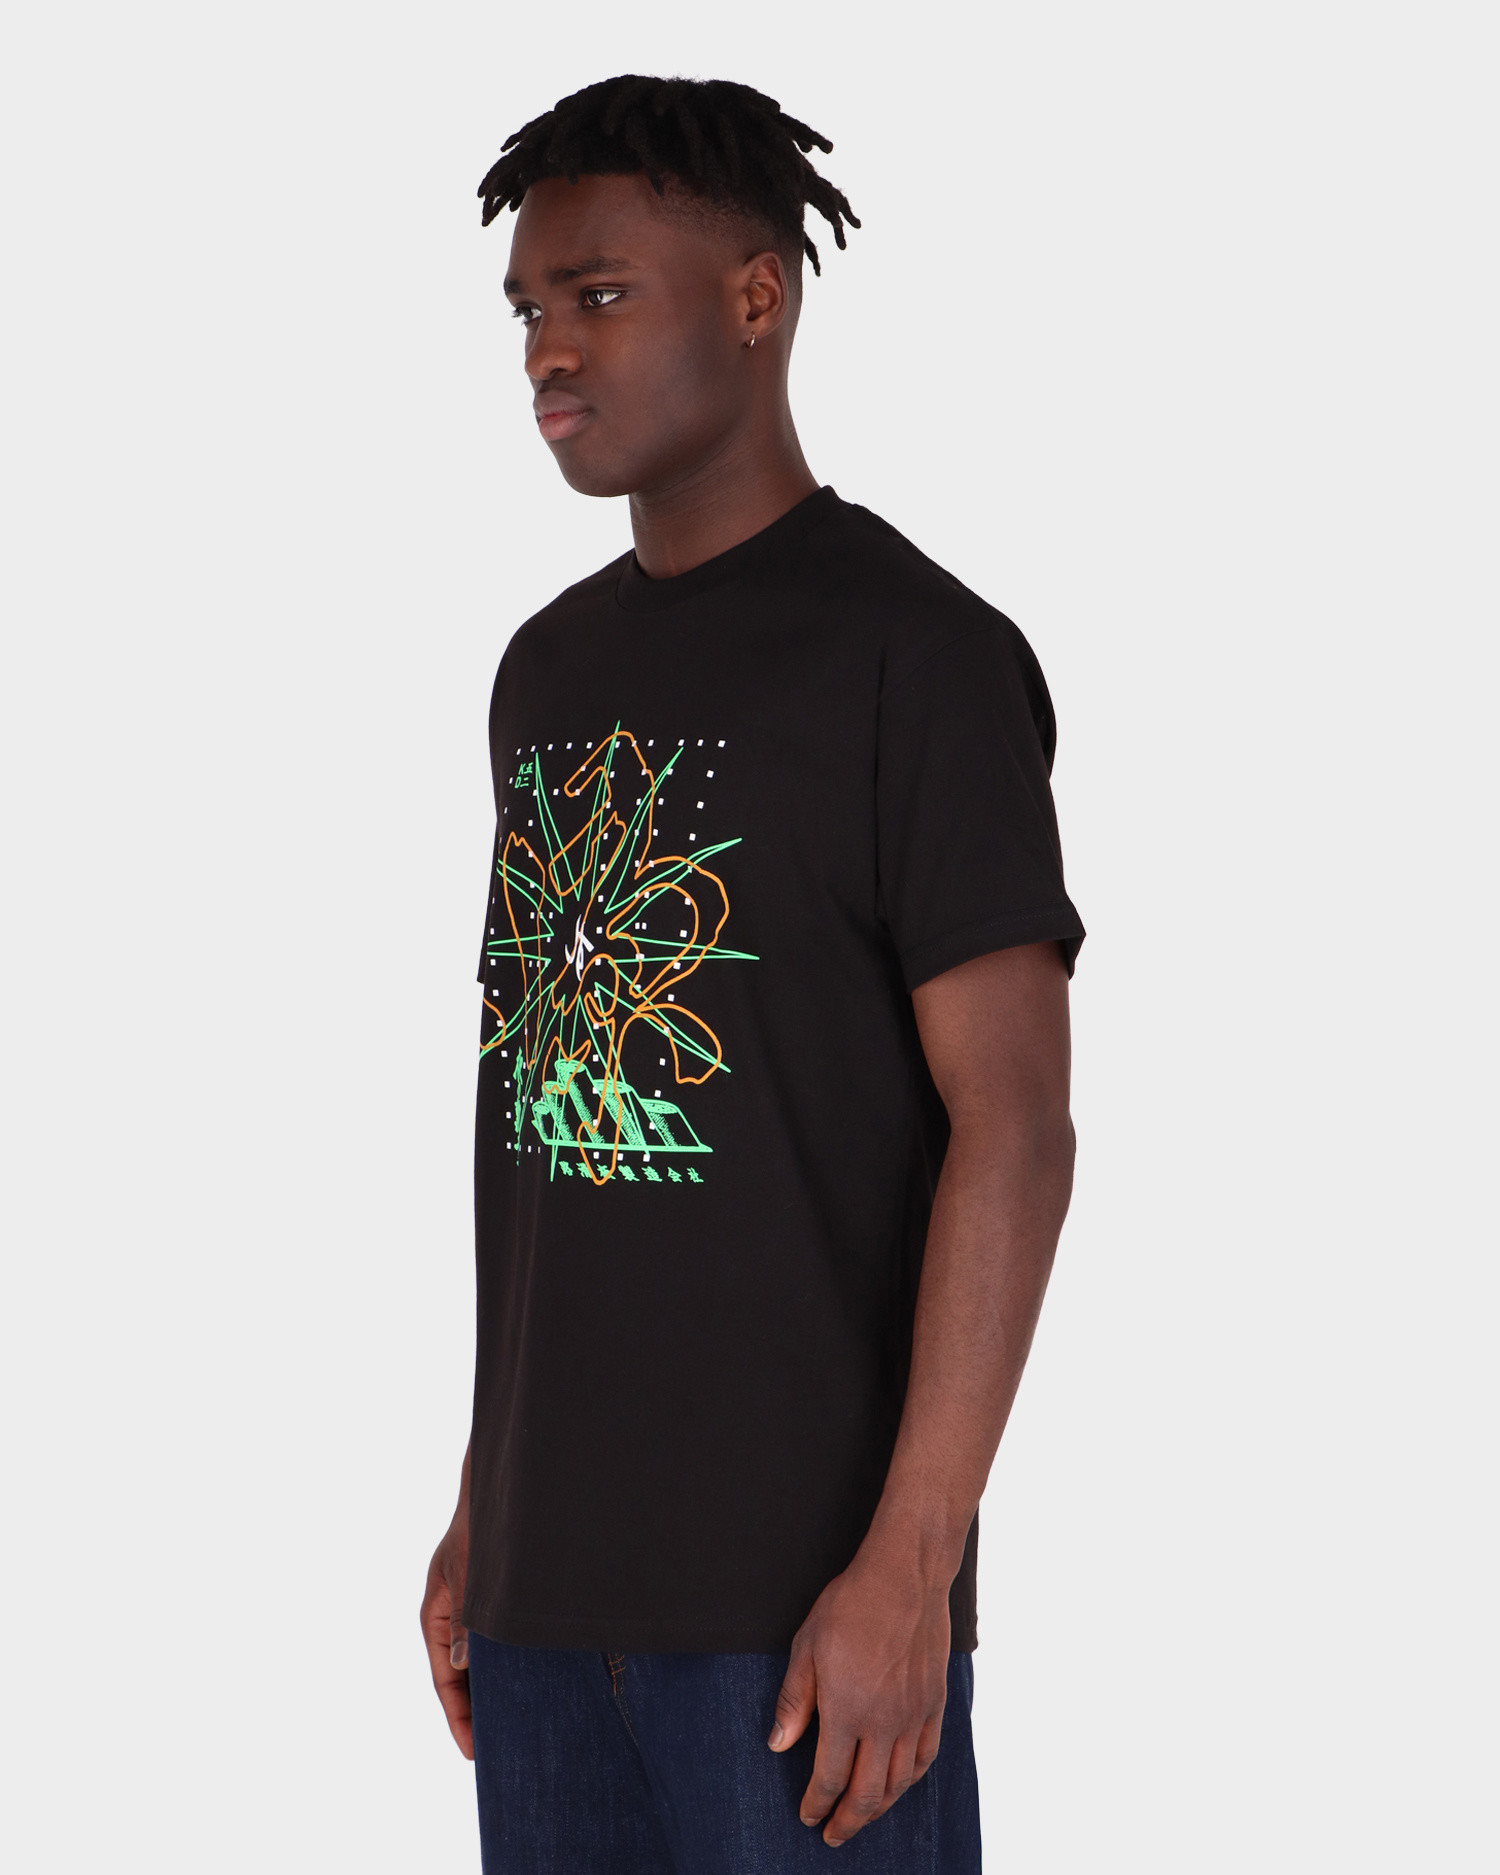 Evisen Tyrell T-shirt Black